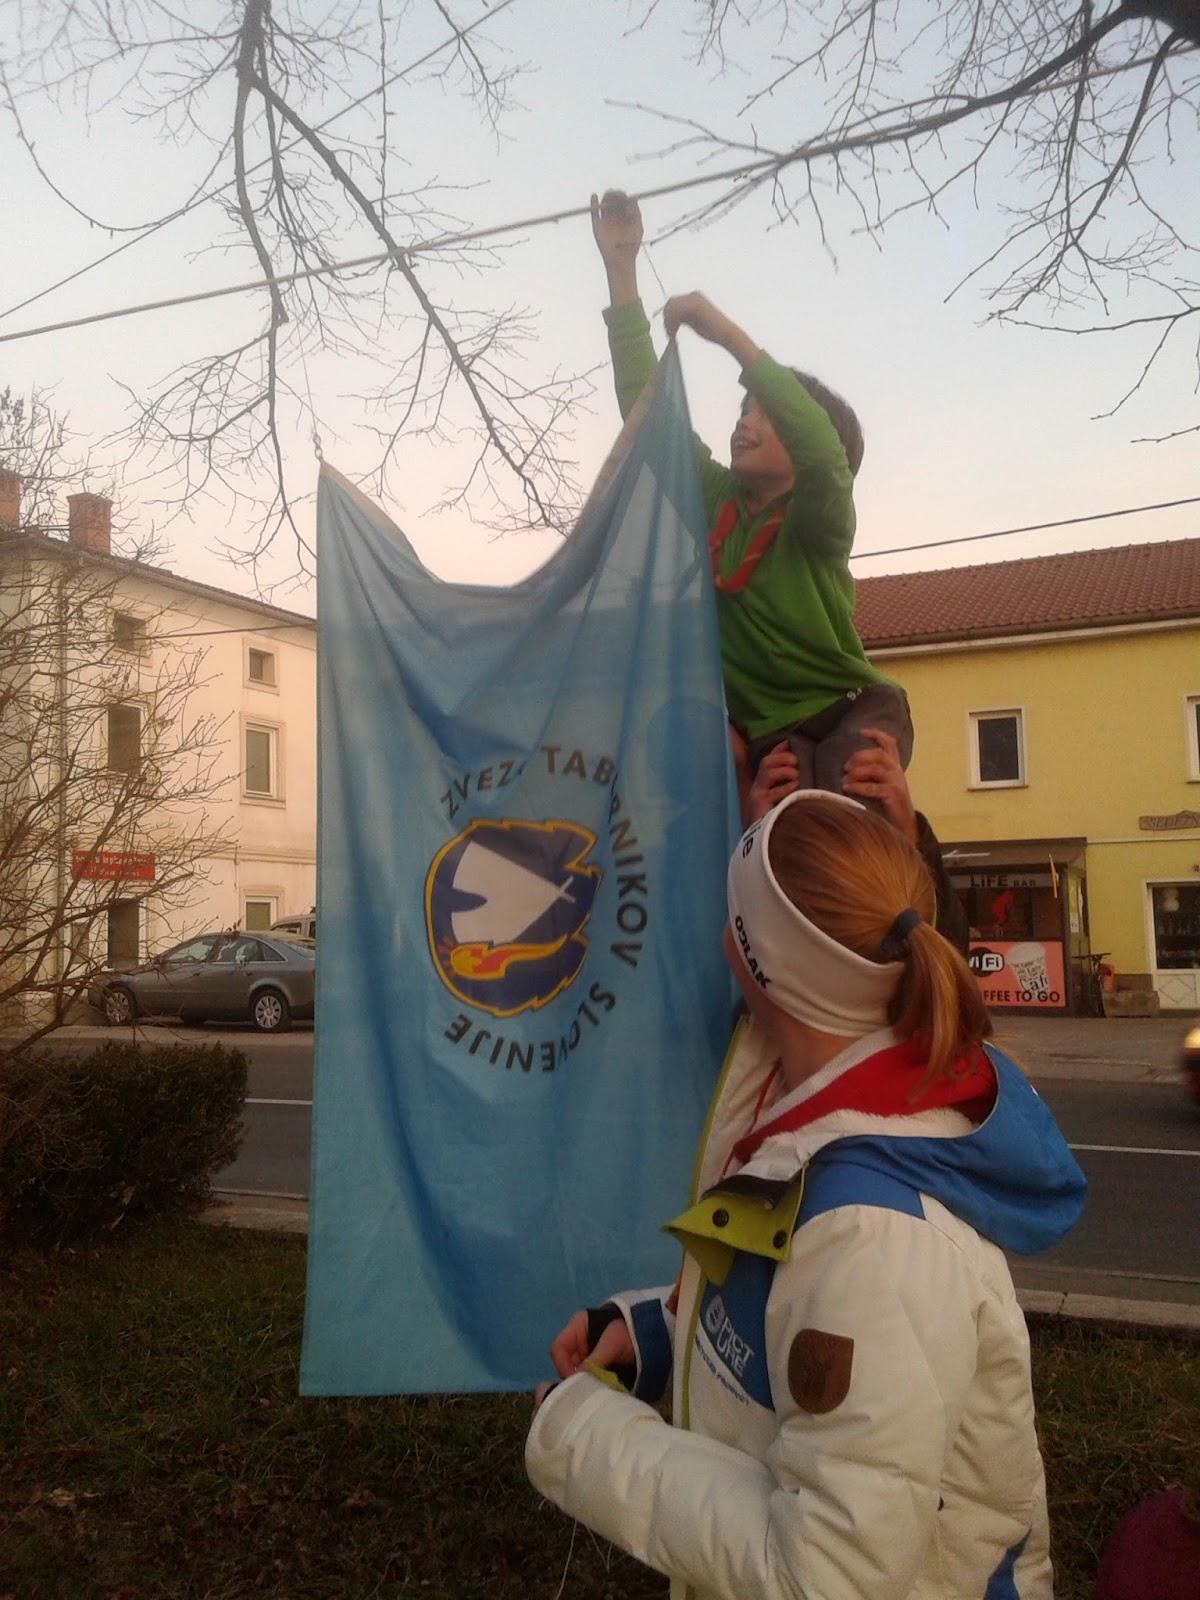 MČ pekarija, Ilirska Bistrica, 10. in 12. december - 20151212_162012.jpg